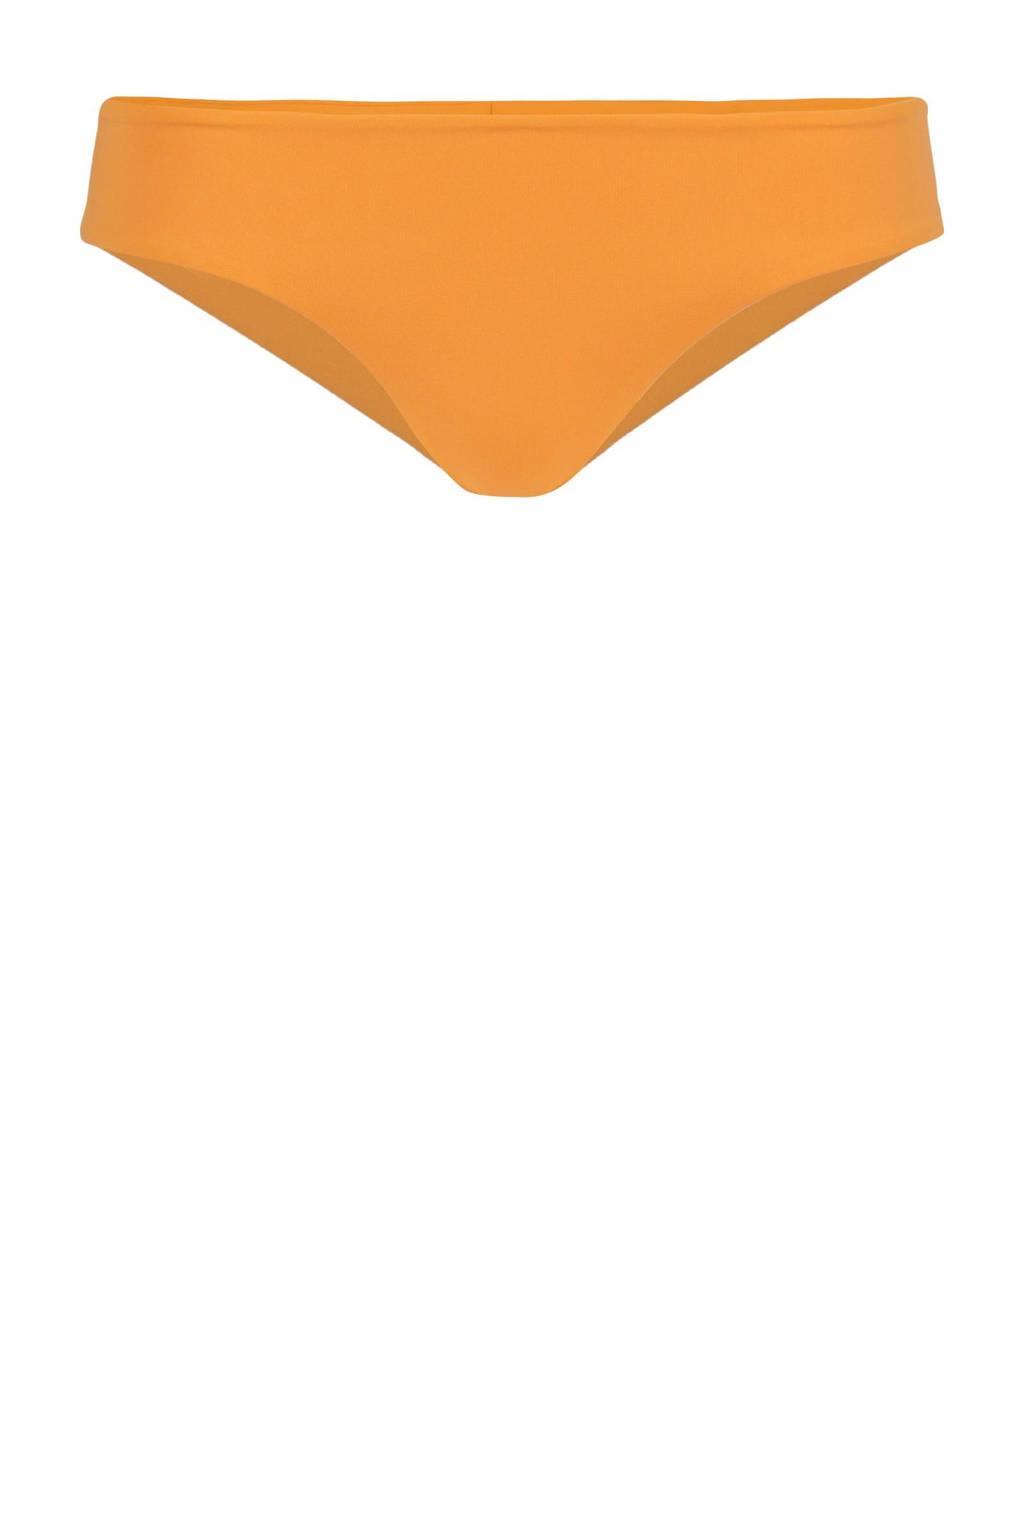 O'Neill Blue bikinibroekje Maoi oranje, Oranje